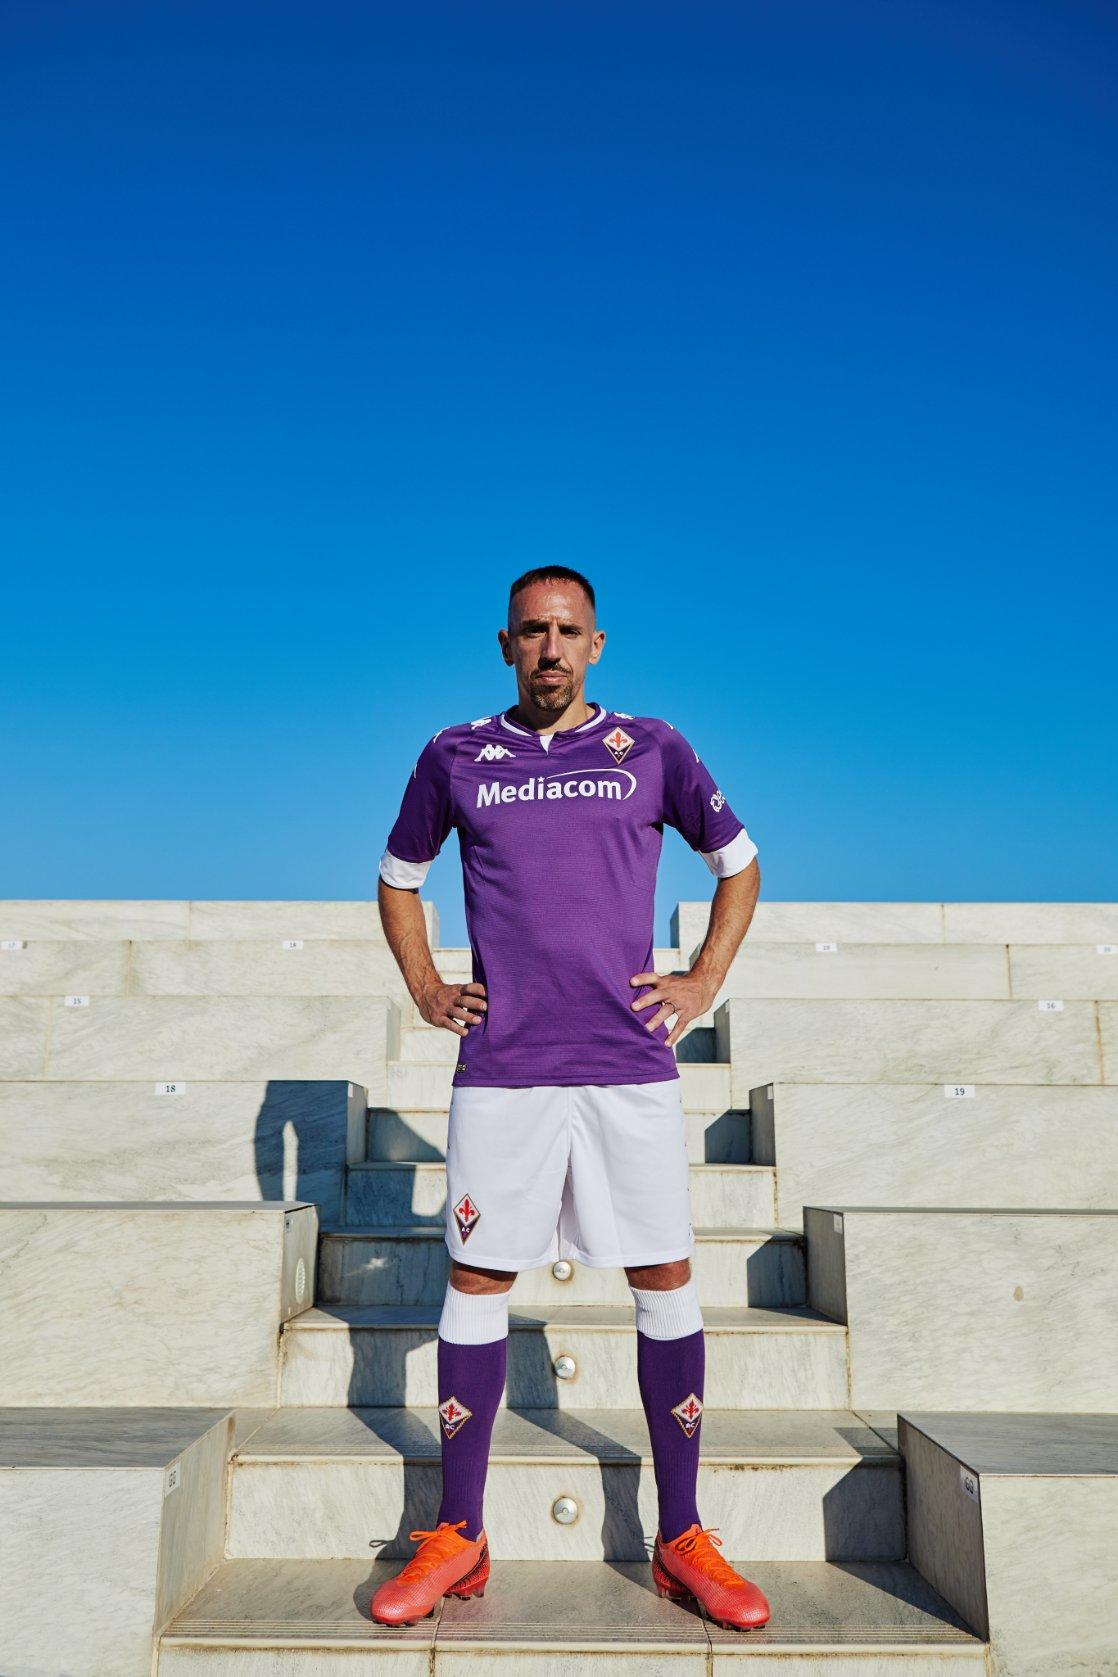 Fiorentina 2020-21 Kappa Home Kit | 20/21 Kits | Football shirt blog